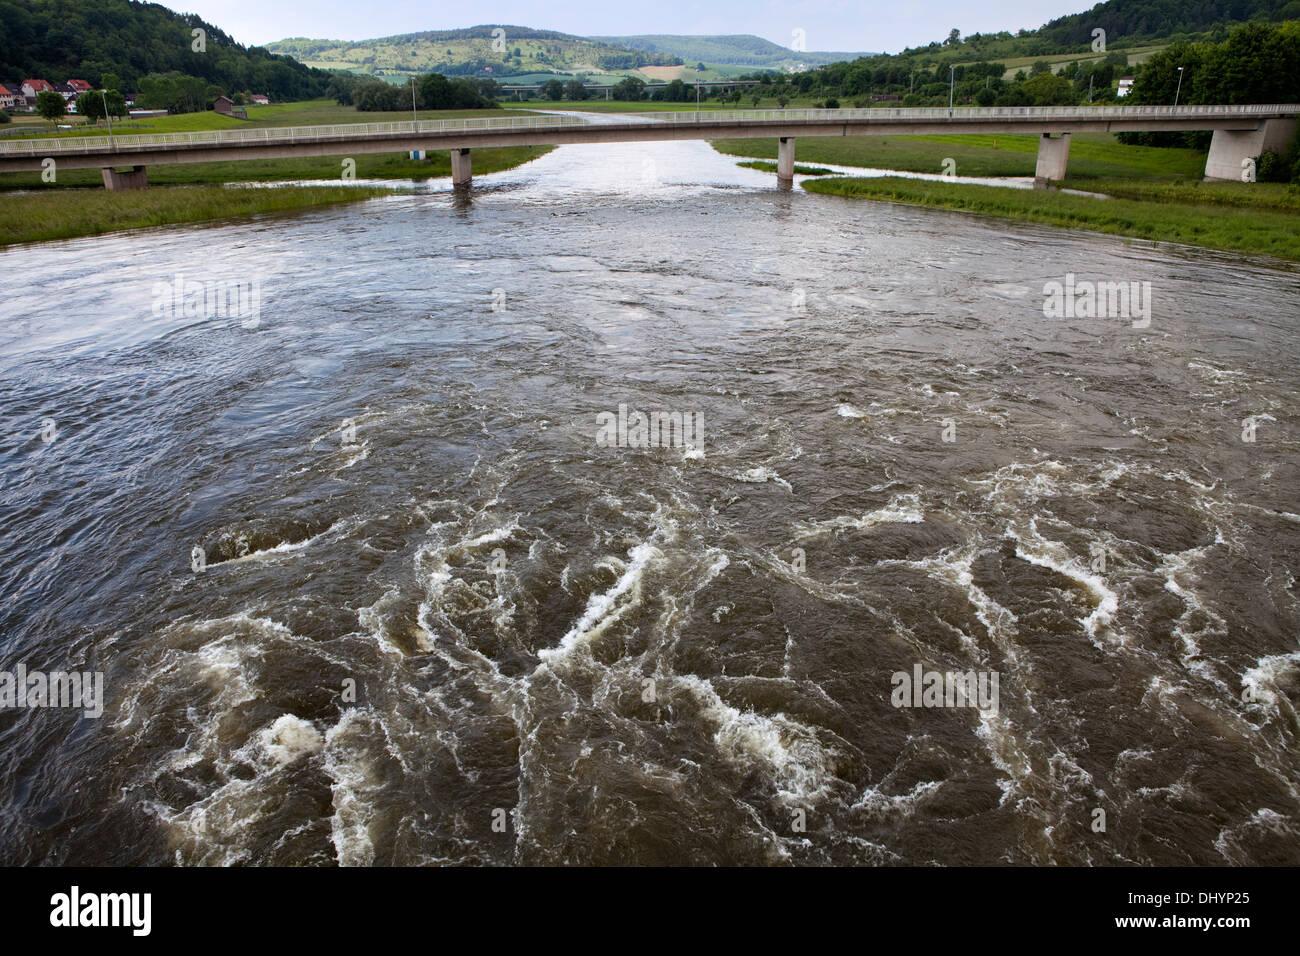 Flooded flood-retention basin of the Leine river, Salzderhelden, Einbeck, Lower Saxony, Germany, Europe, - Stock Image